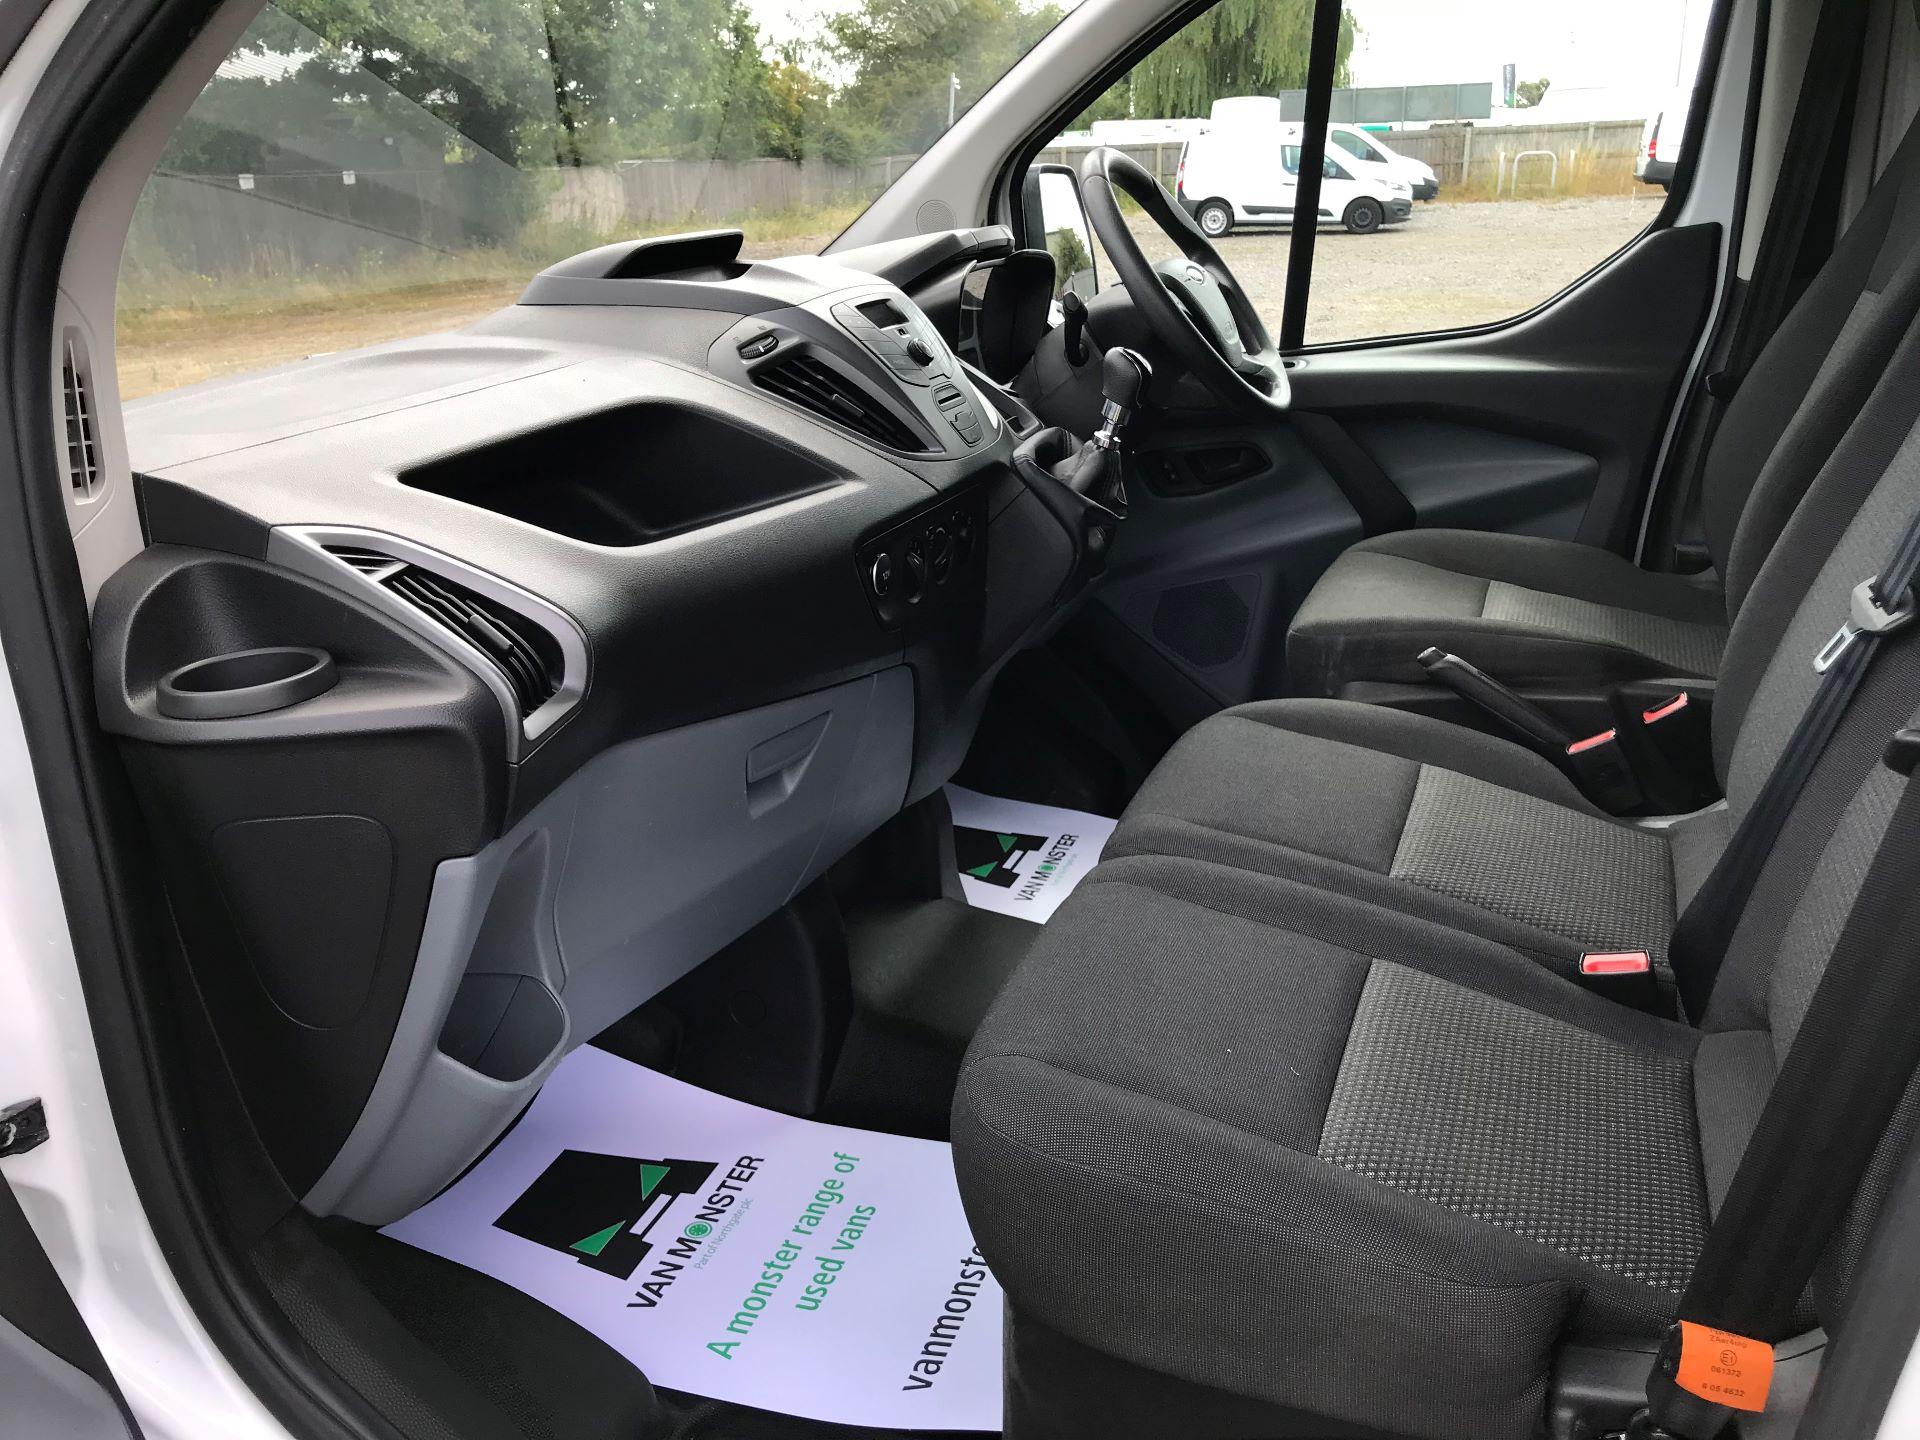 2016 Ford Transit Custom 290 L1 DIESEL FWD 2.2 TDCI 100PS LOW ROOF VAN EURO 5 (FA16UOD) Image 20